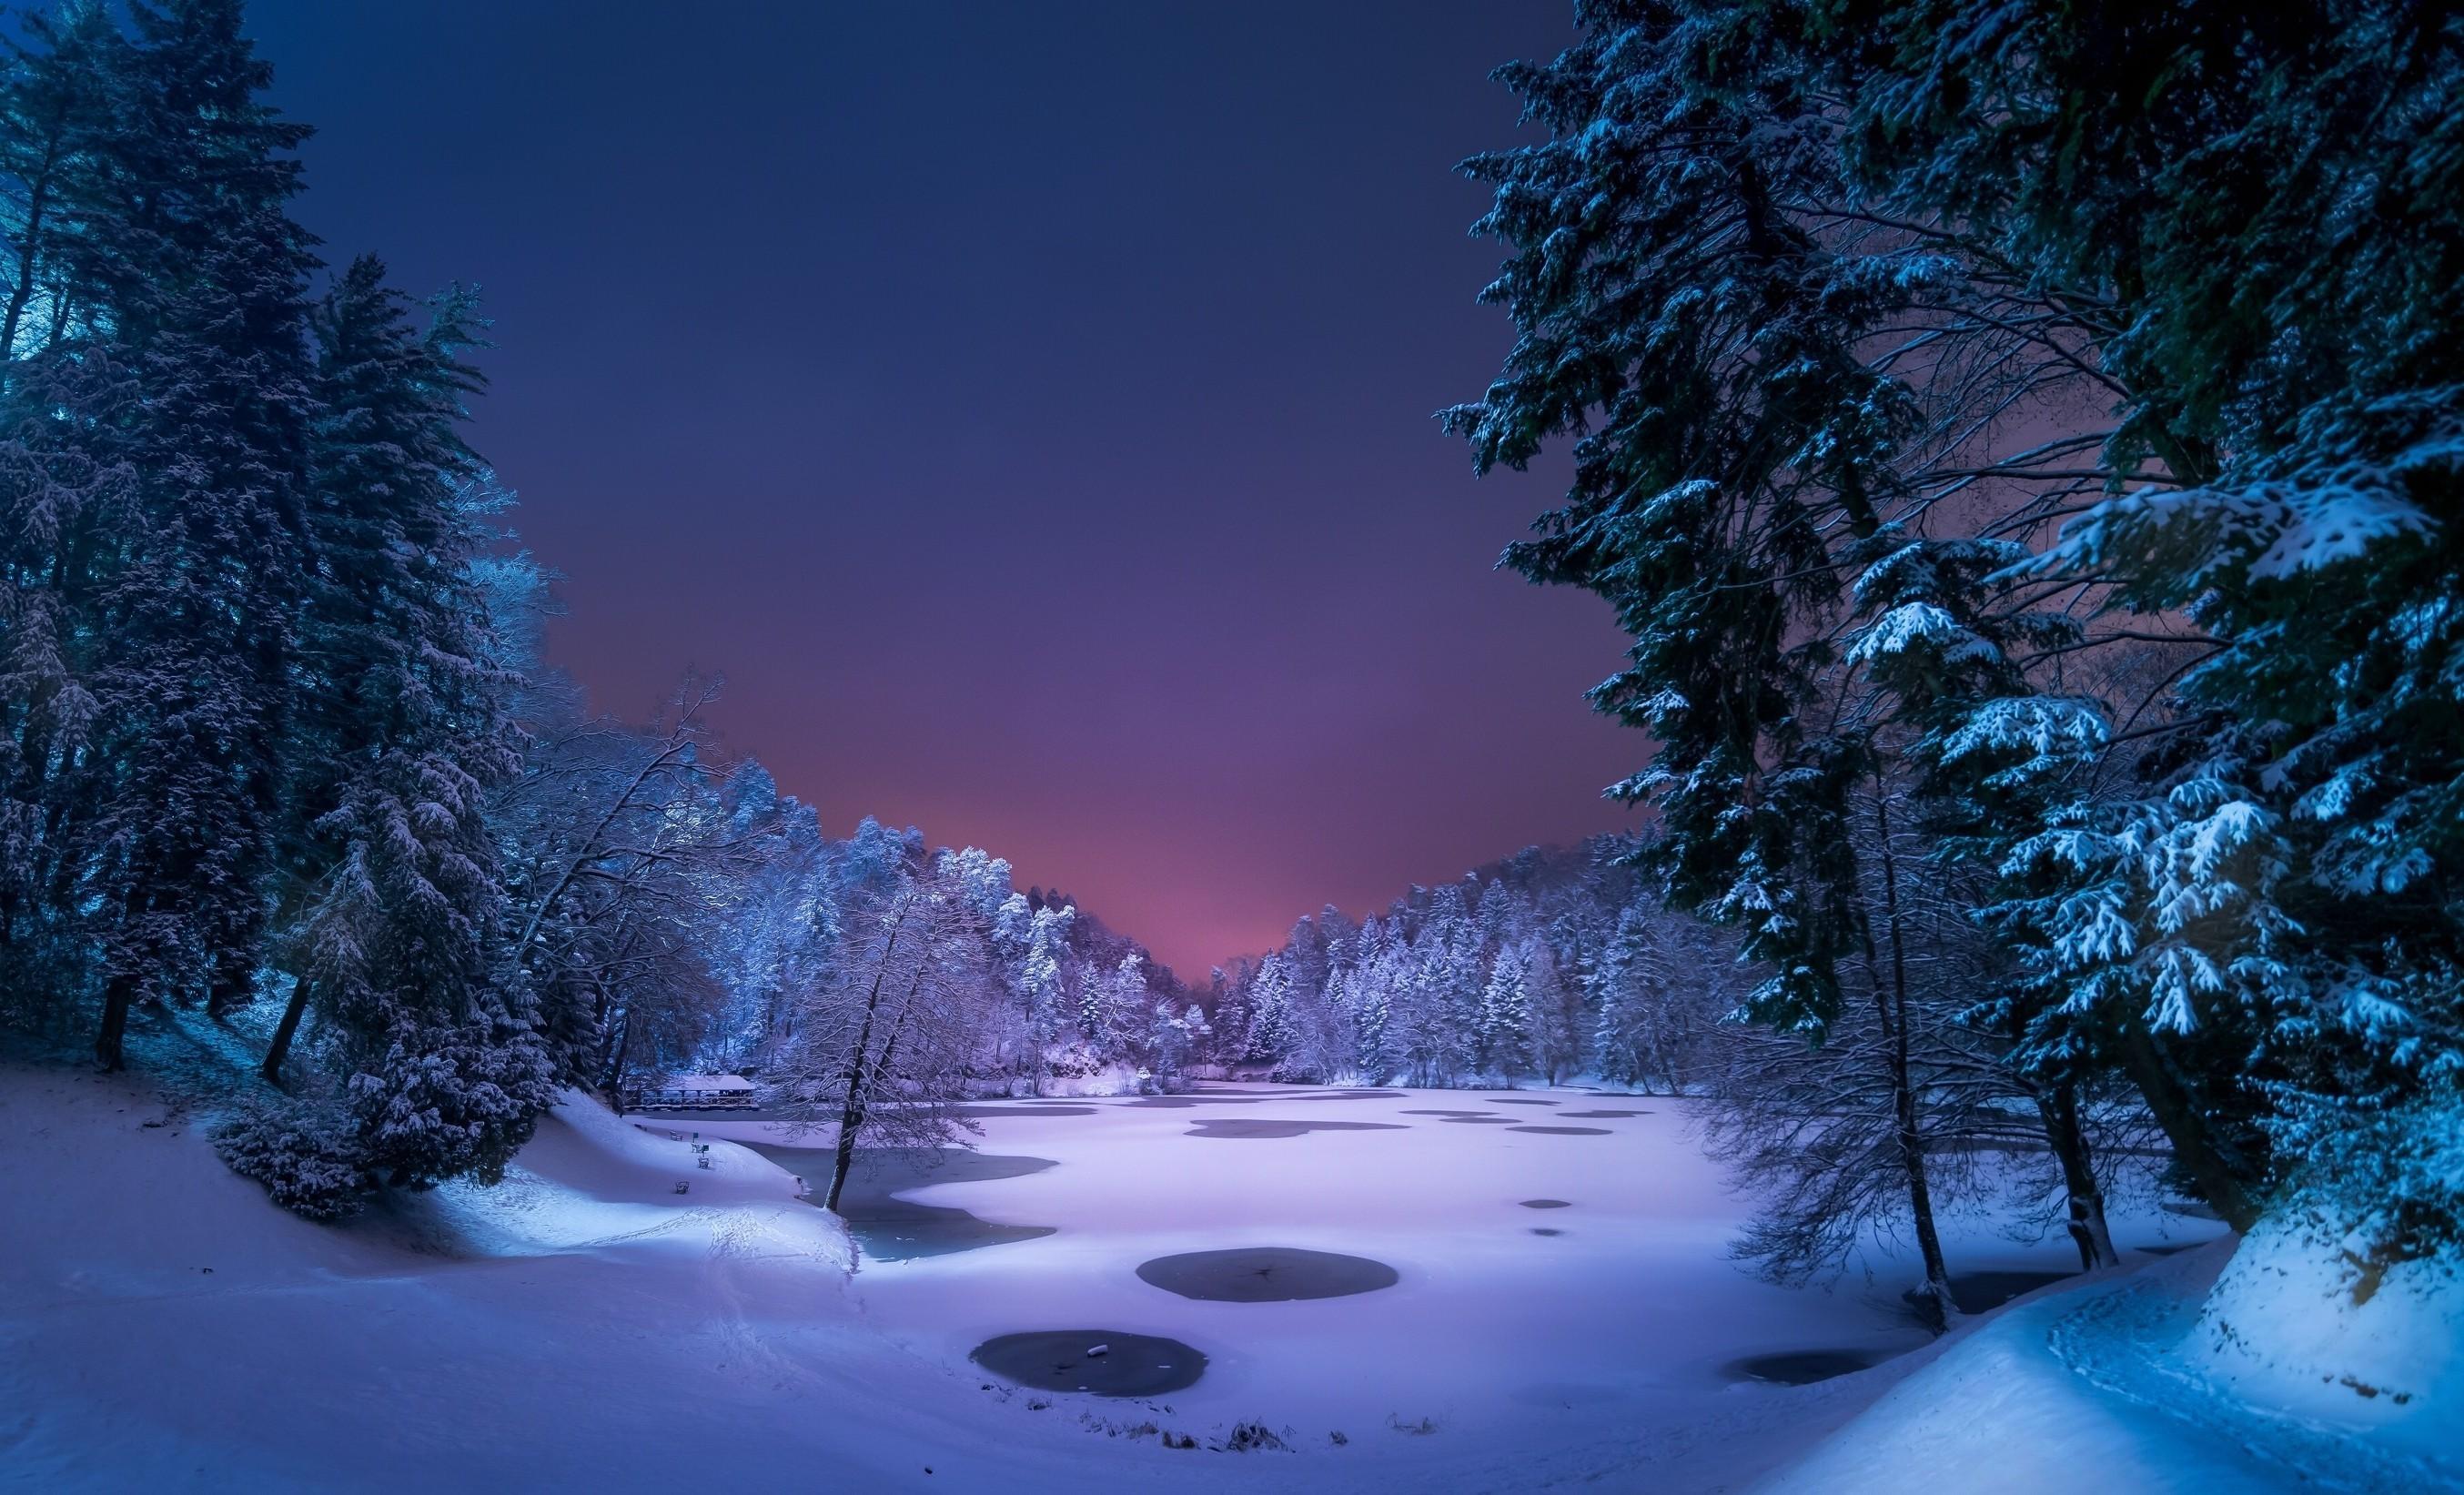 Winter Nature Wallpaper 74 Images